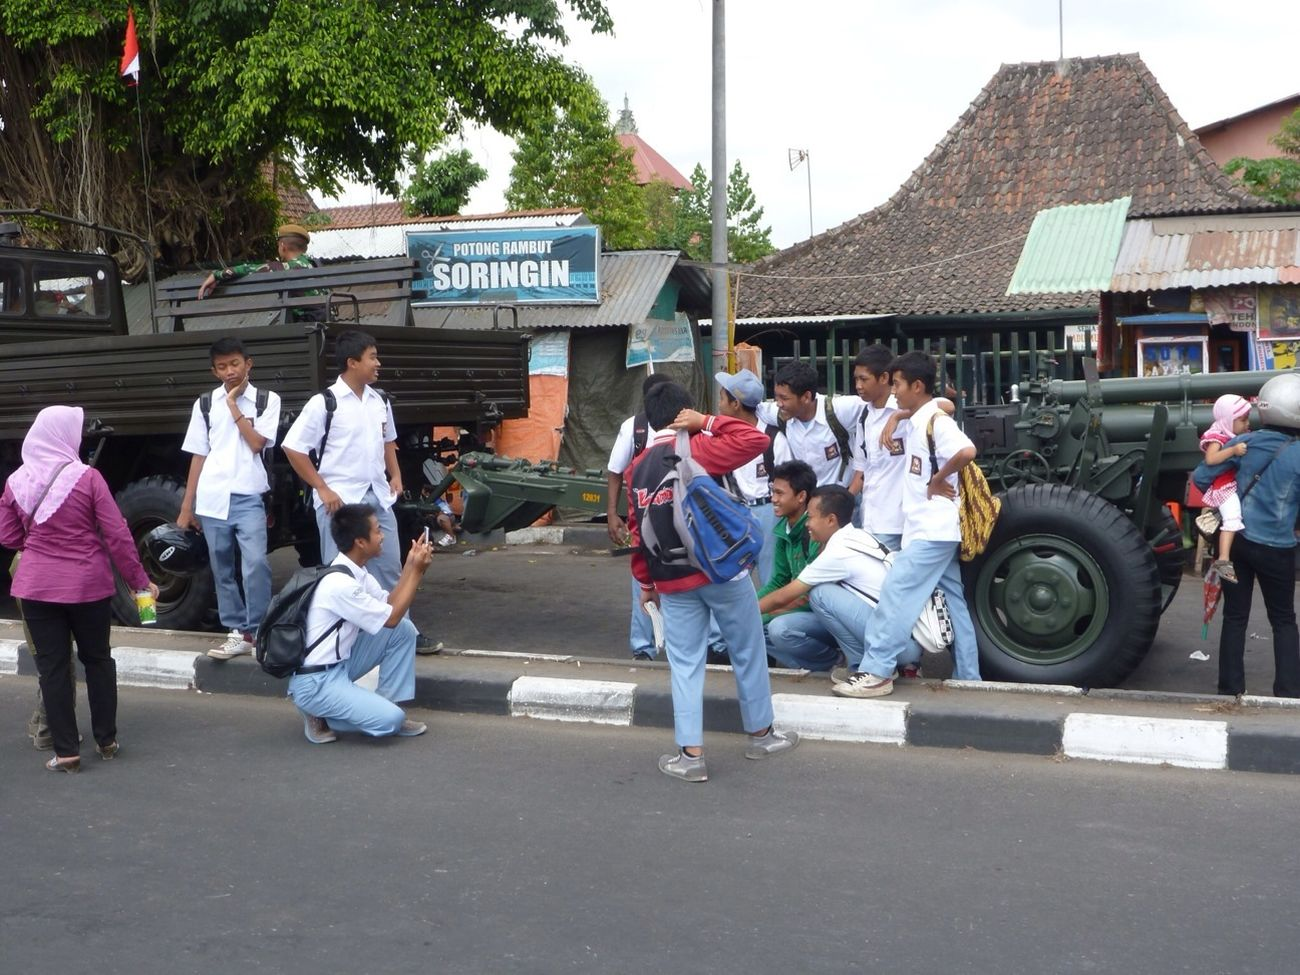 Streetphotography Taking Photos Yogyakarta GangPolos Jogja